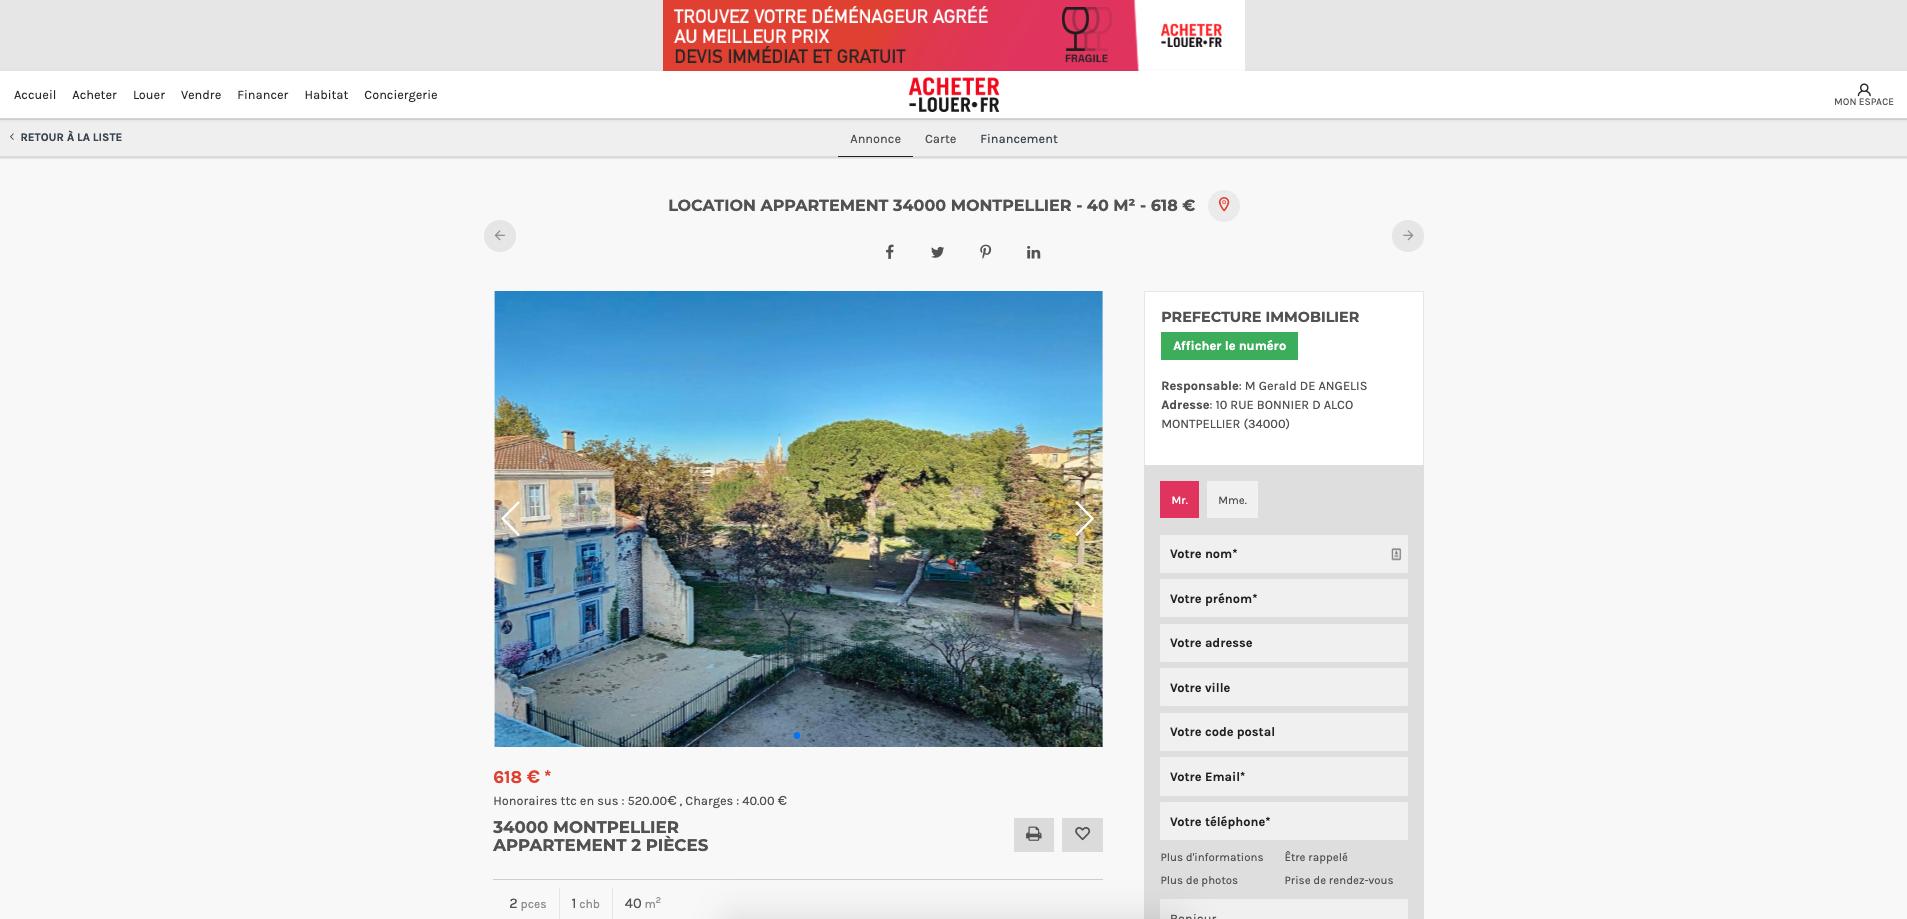 Marketplace location Acheter-louer.fr